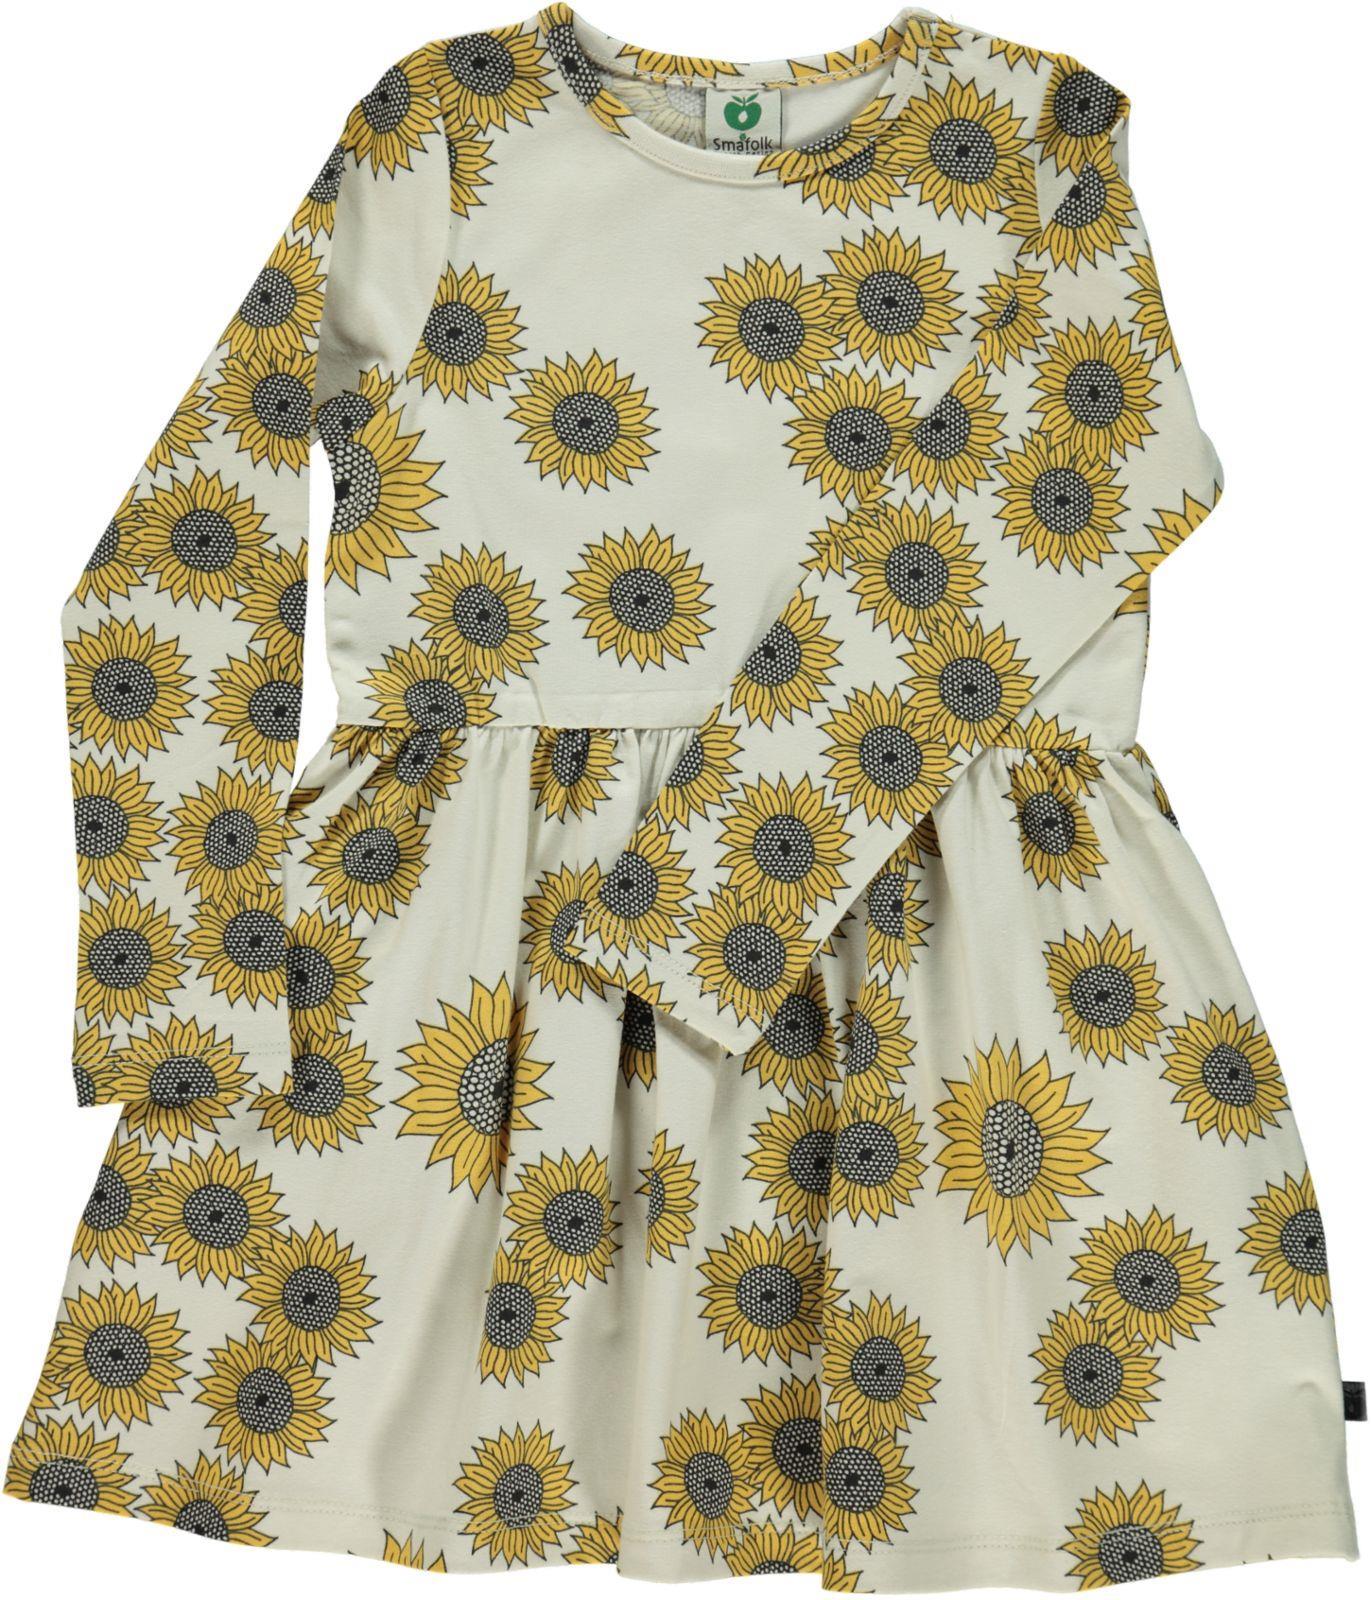 Småfolk - Dress w. Sun Flower Print - Kalk